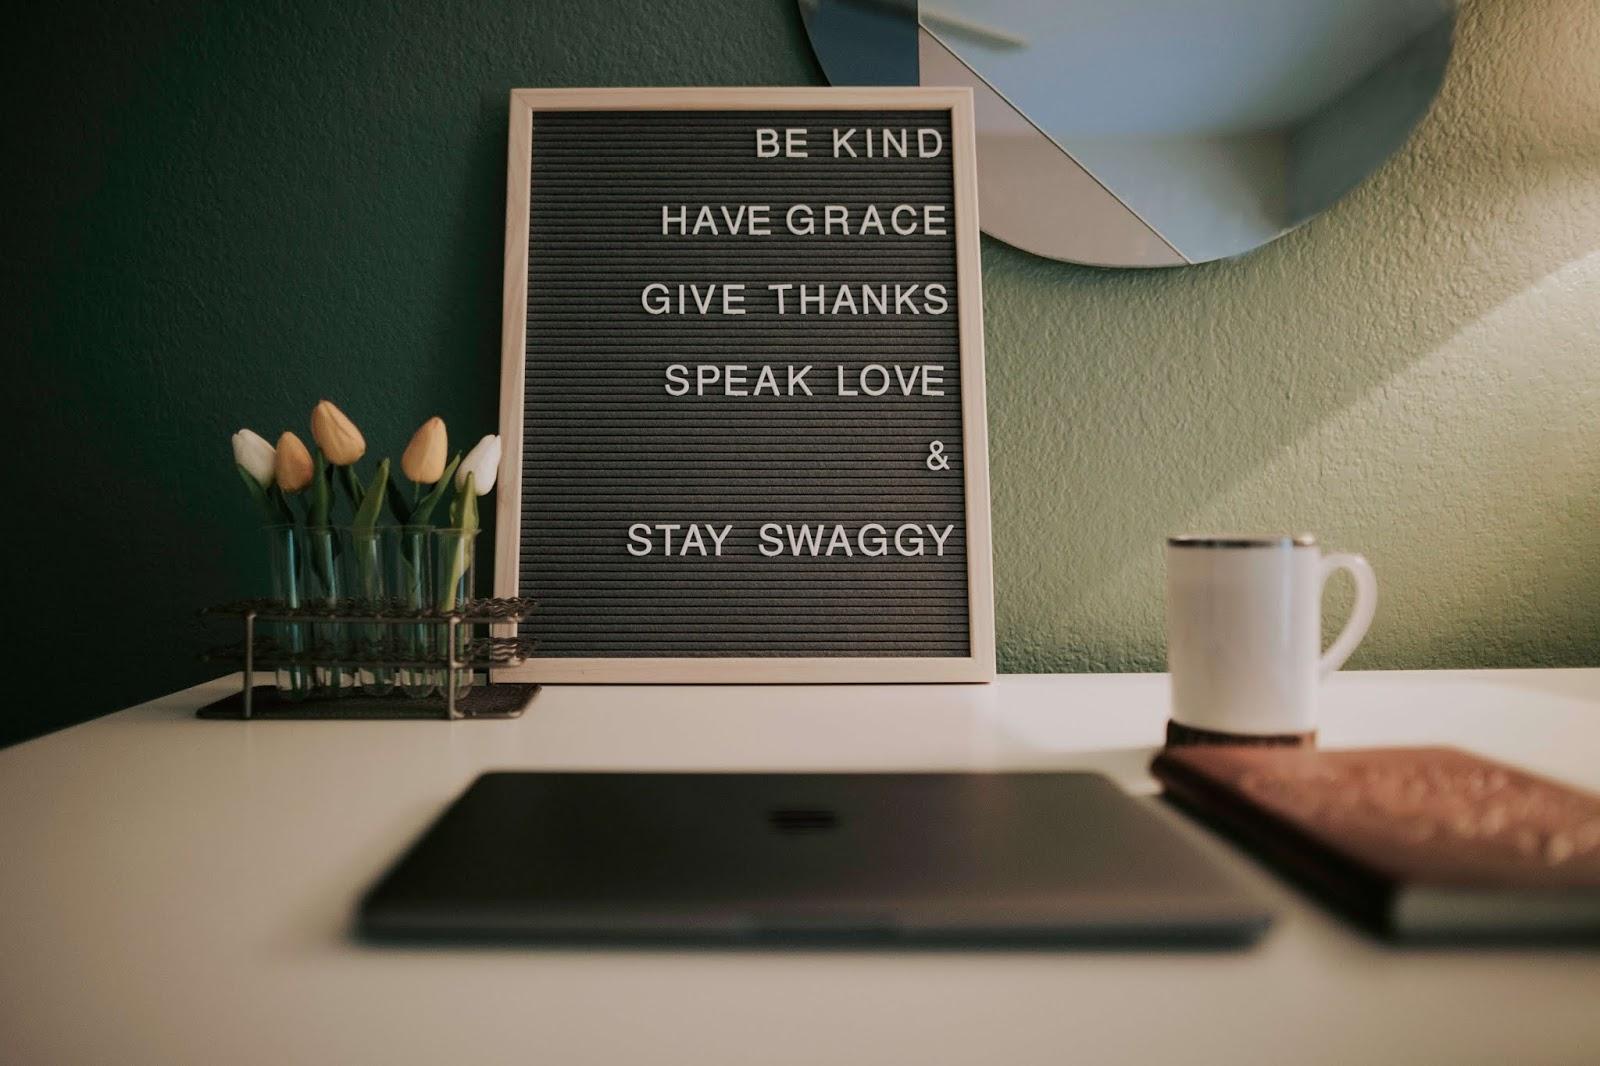 Kata-kata quotes motivasi tahun baru